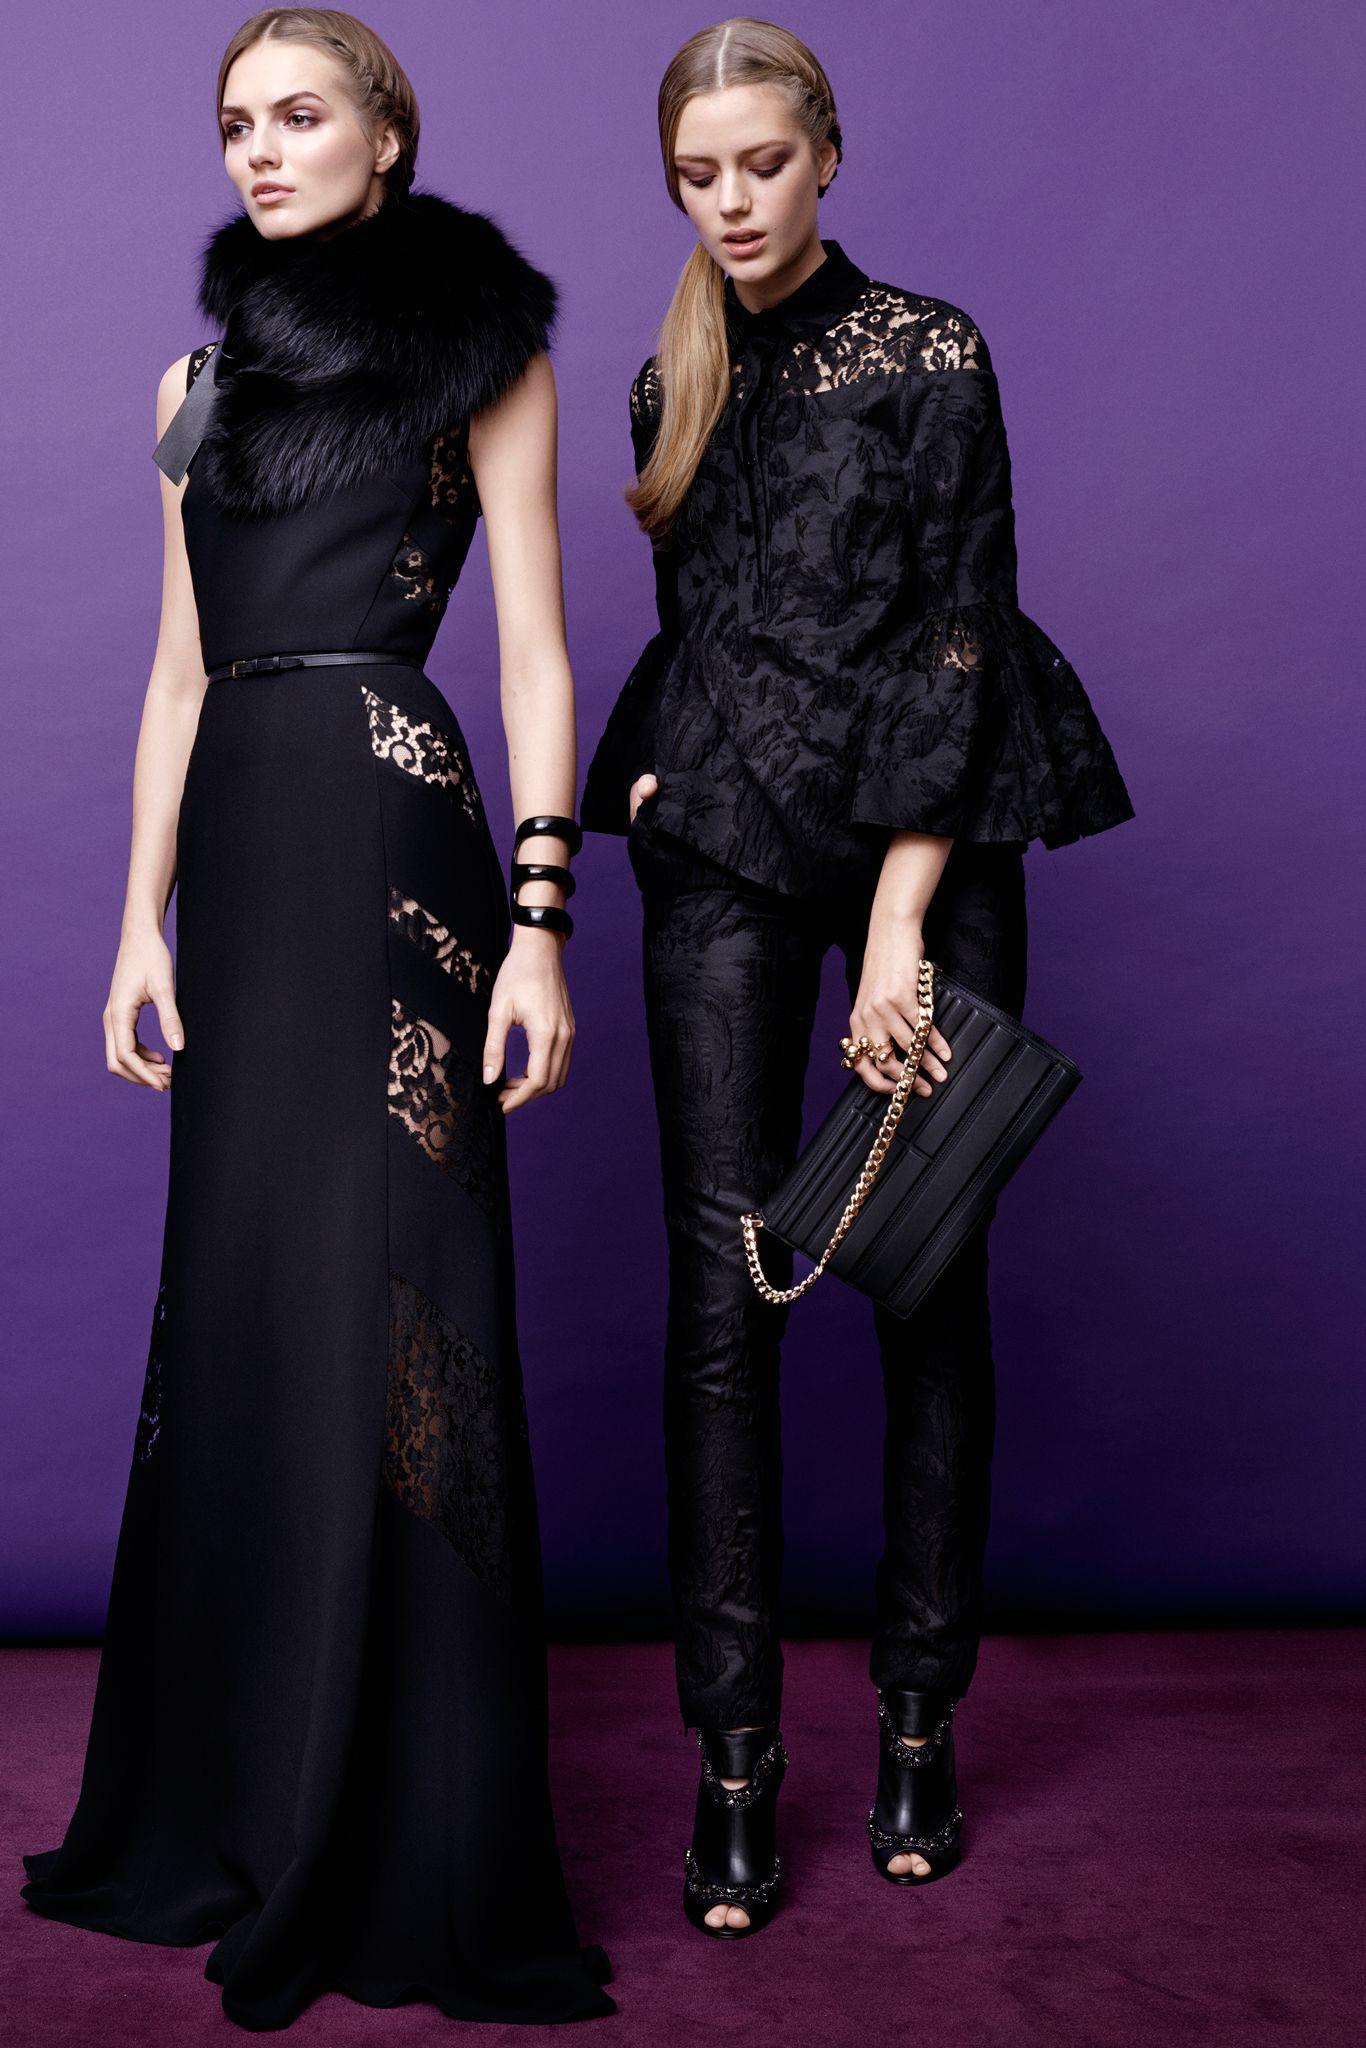 Elie Saab PF 15 look book | Elie saab, Fashion show, 2015